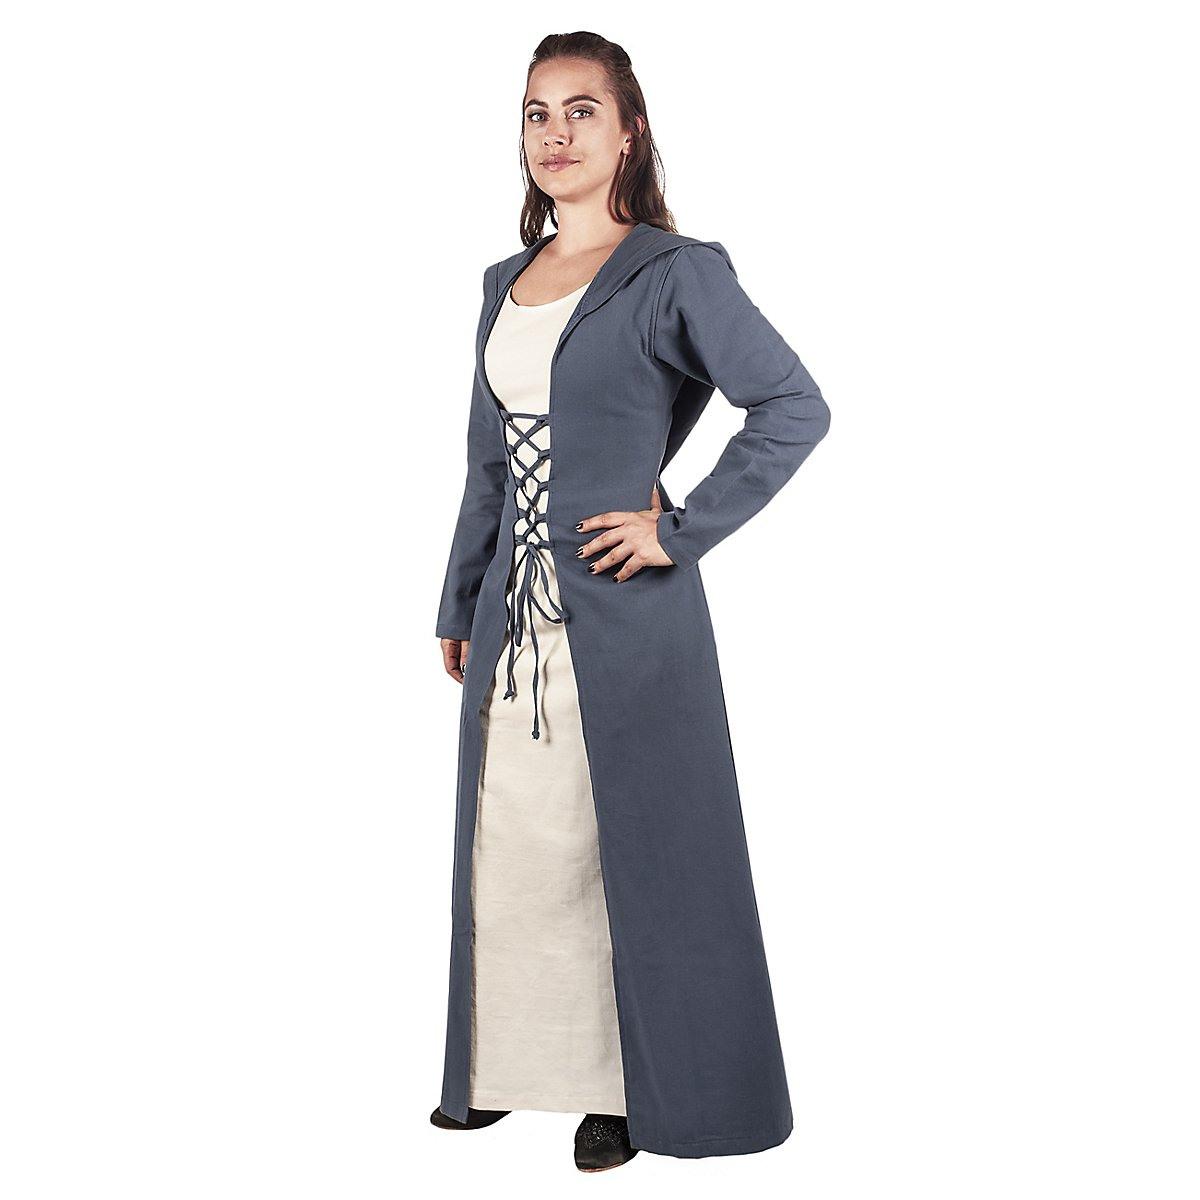 Mittelalter Kleid Mit Kapuze  Hestia  Andracor